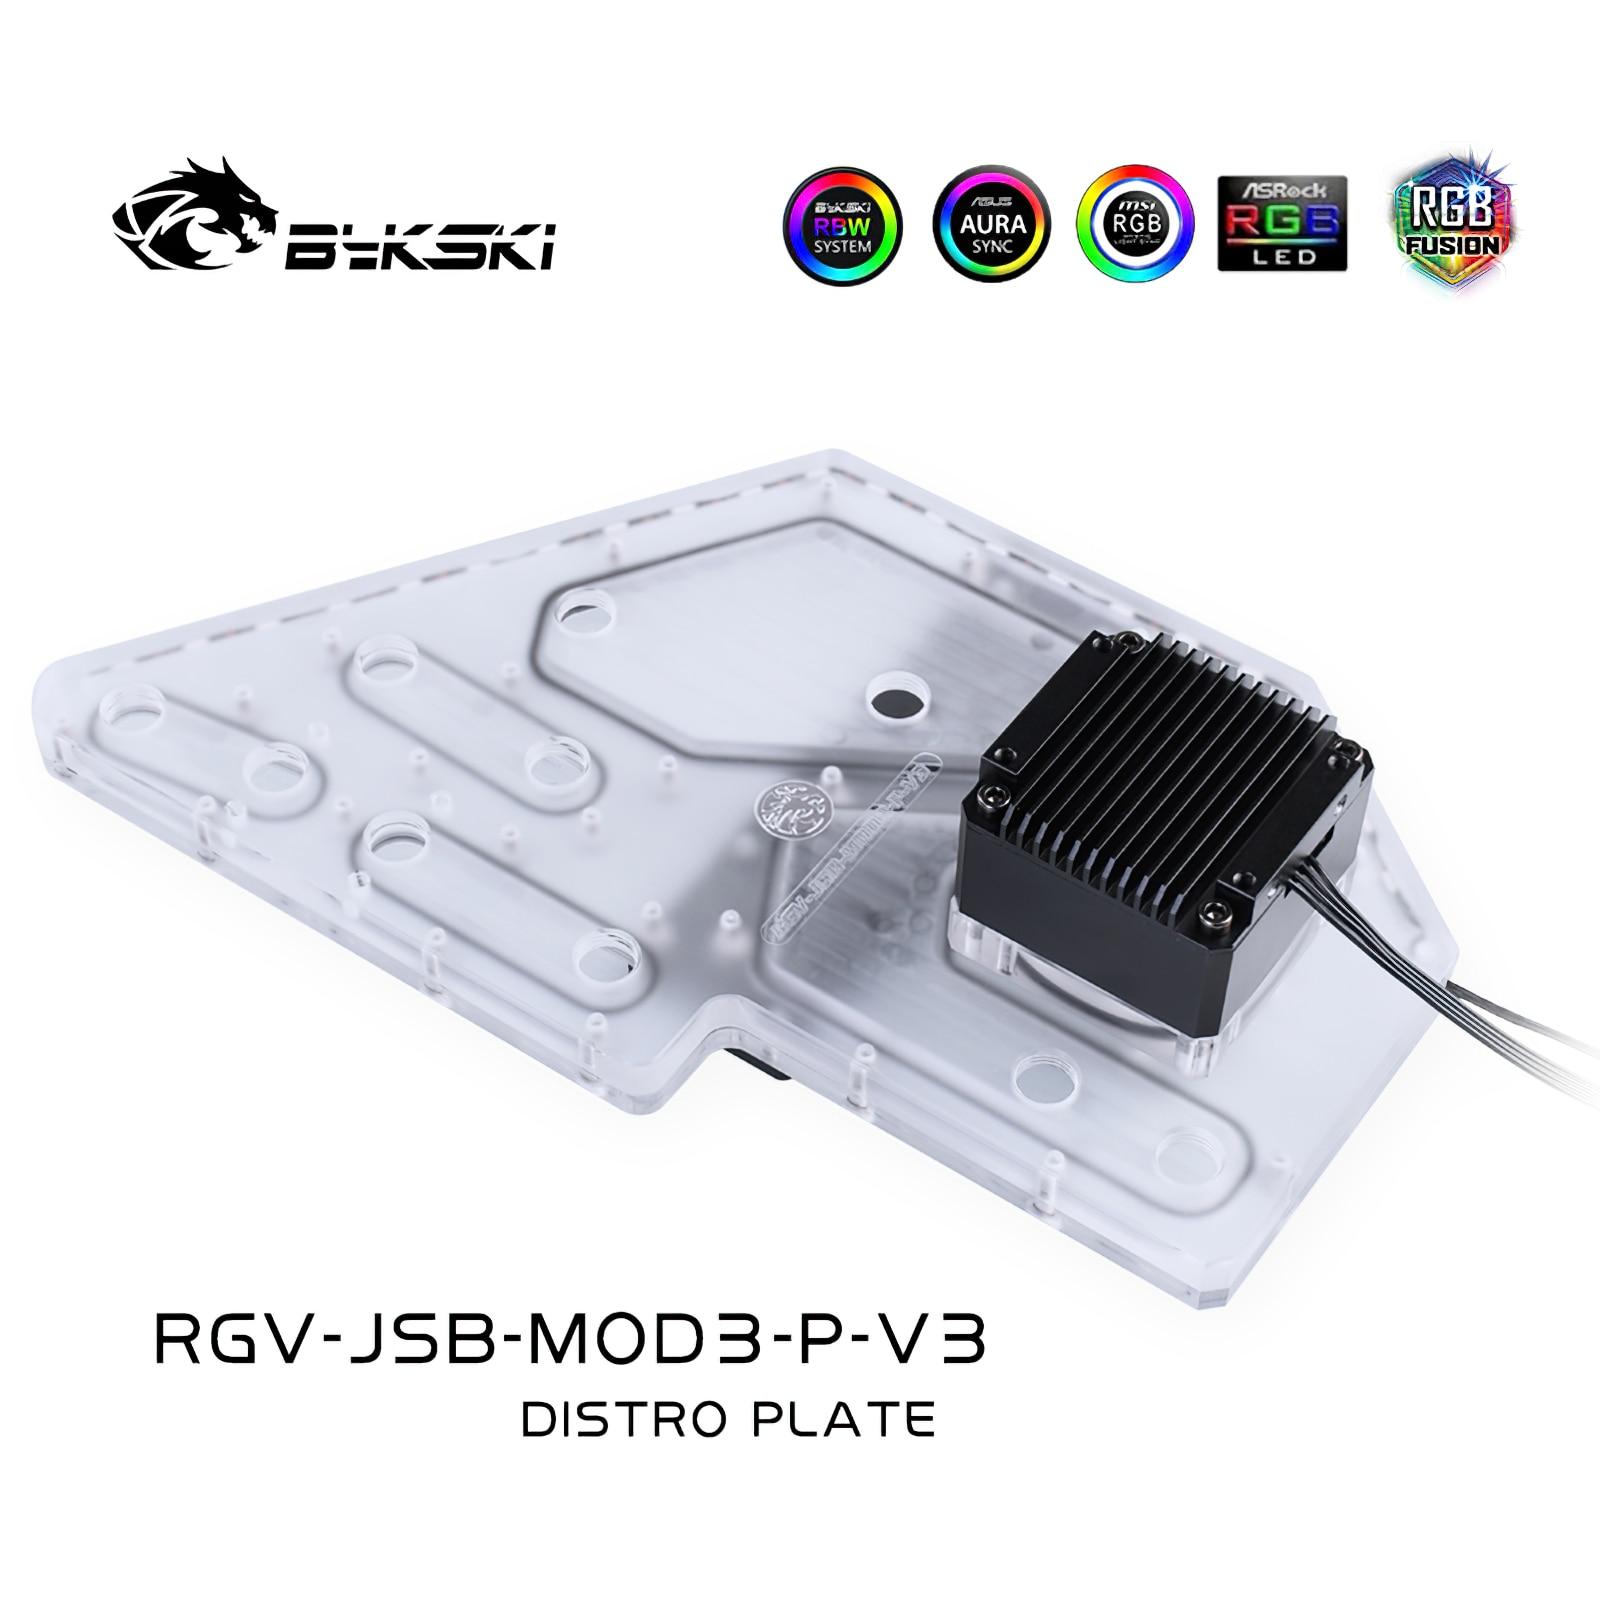 Bykski RGV-JSB-MOD3-P-V3 Distro لوحة ل Jonsbo MOD3 الهيكل